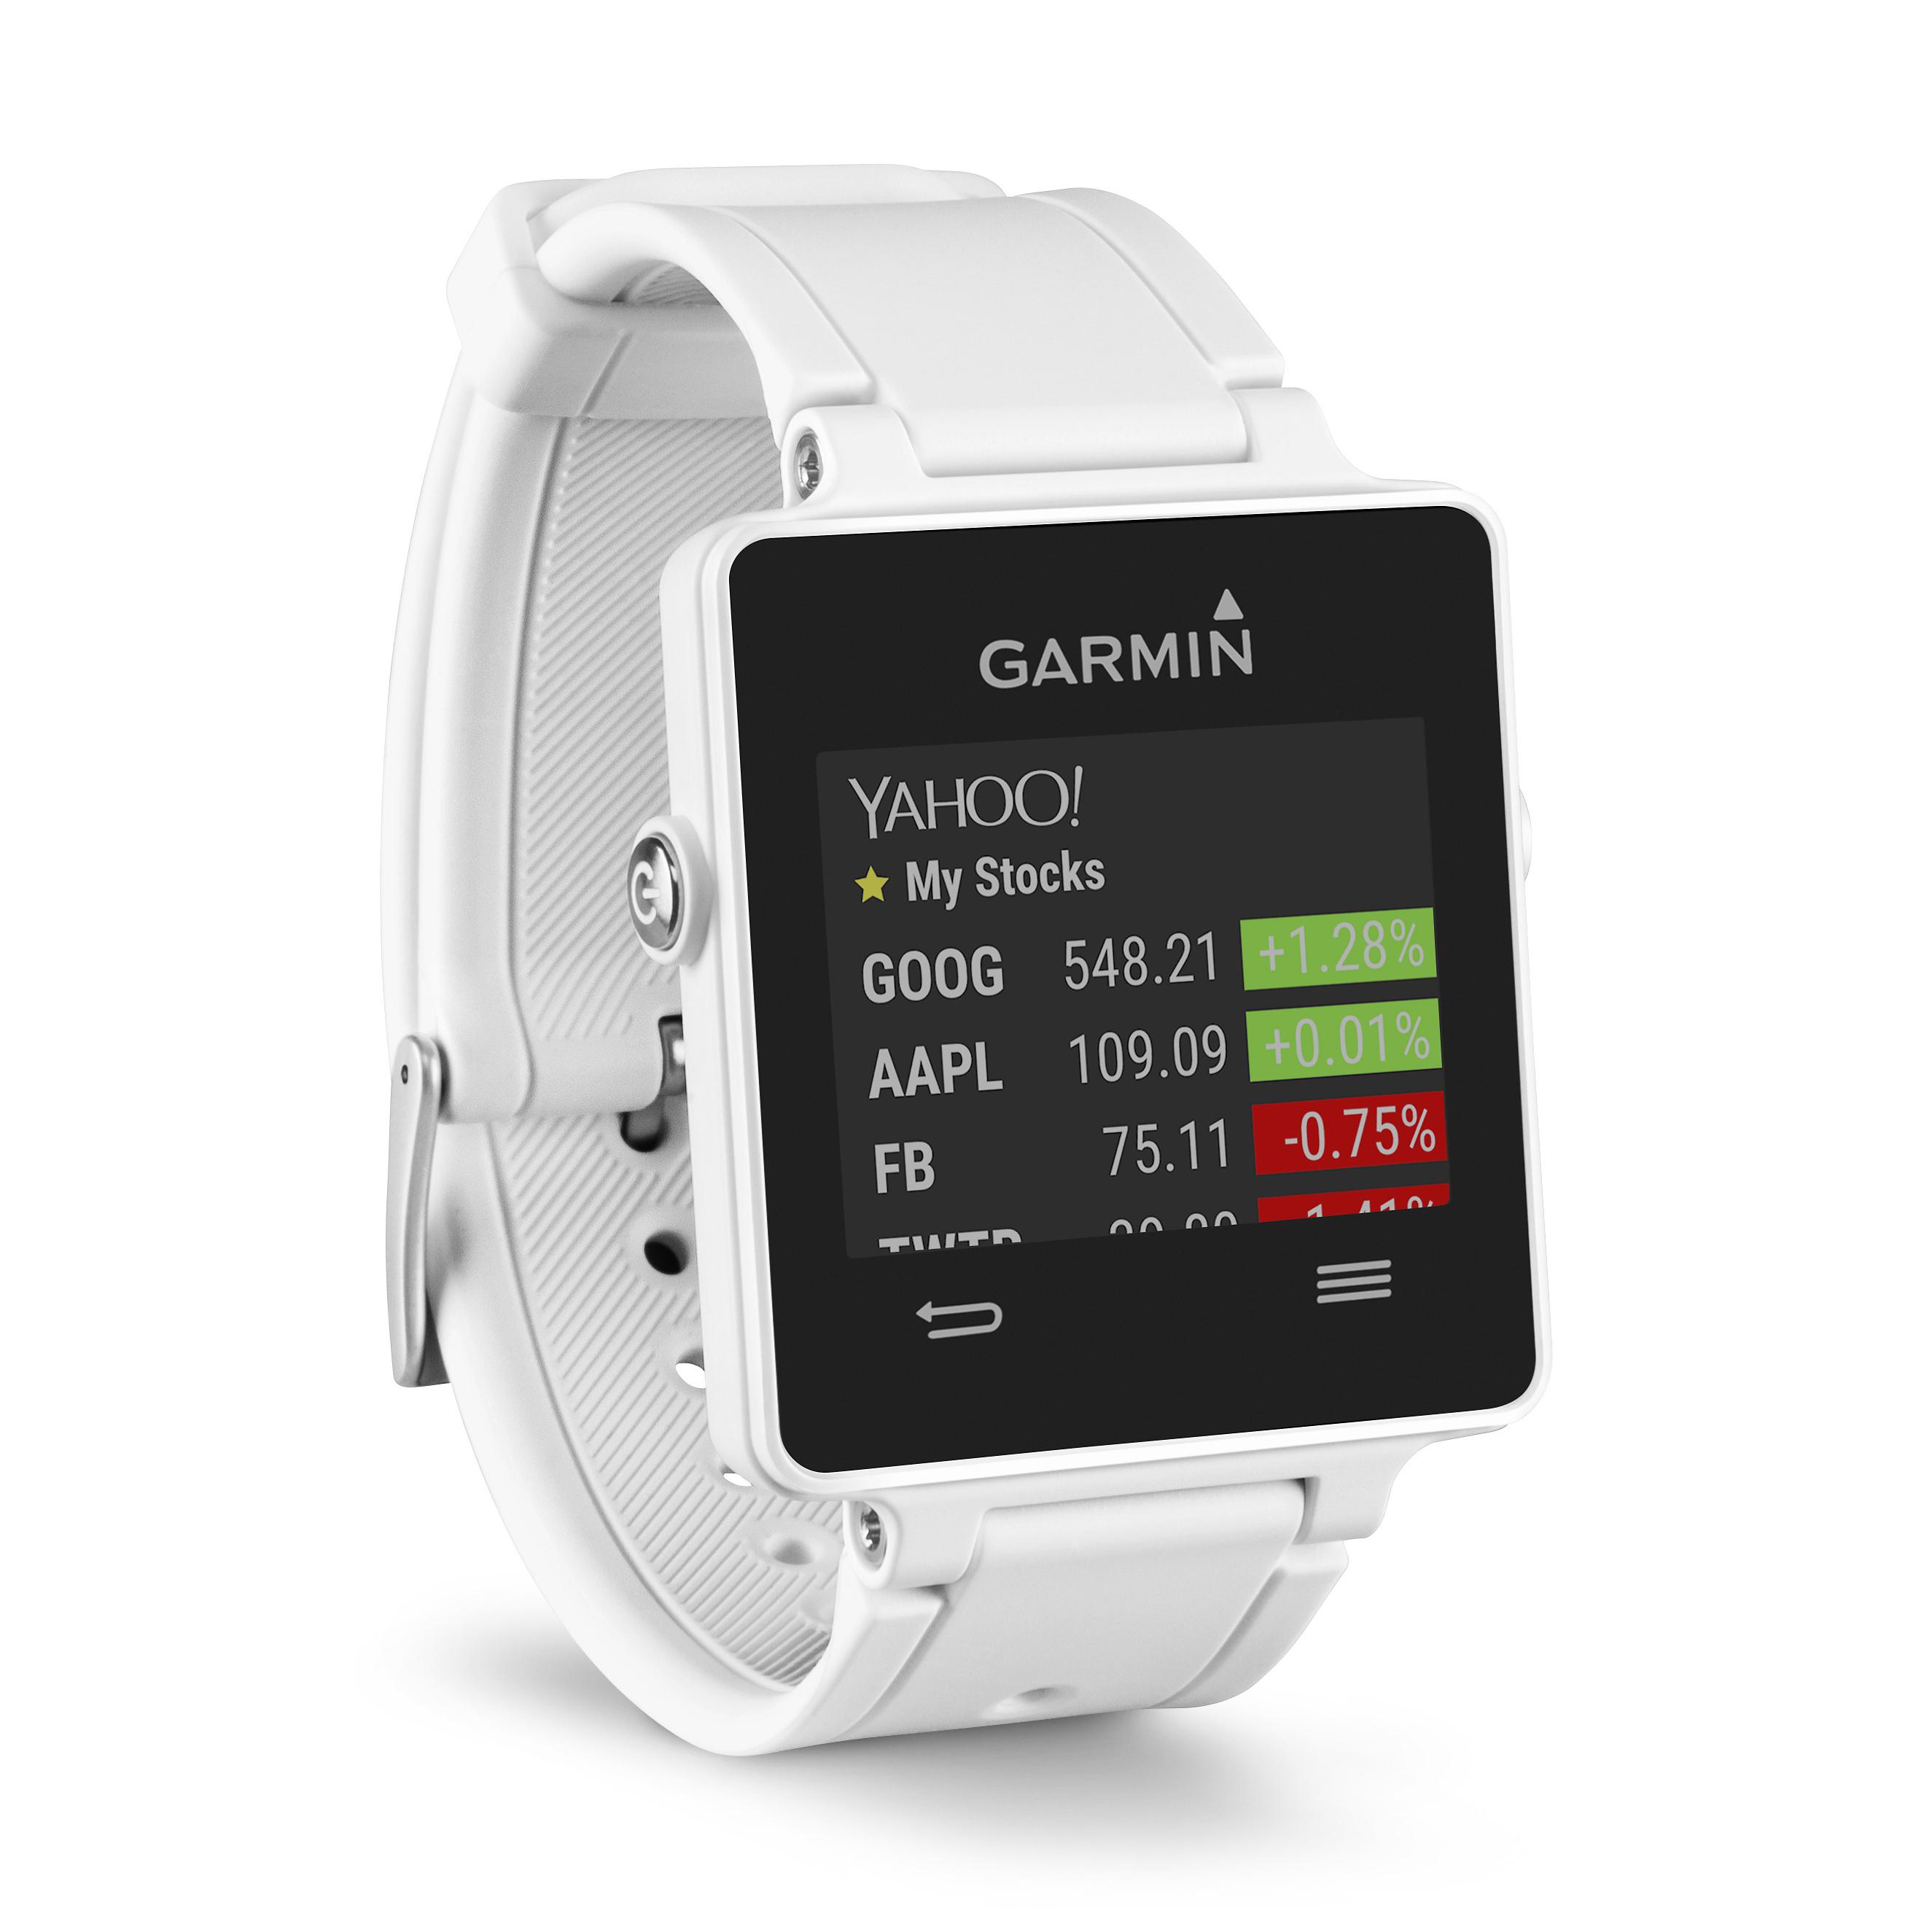 Garmin Vivoactive White Bundle with HRM